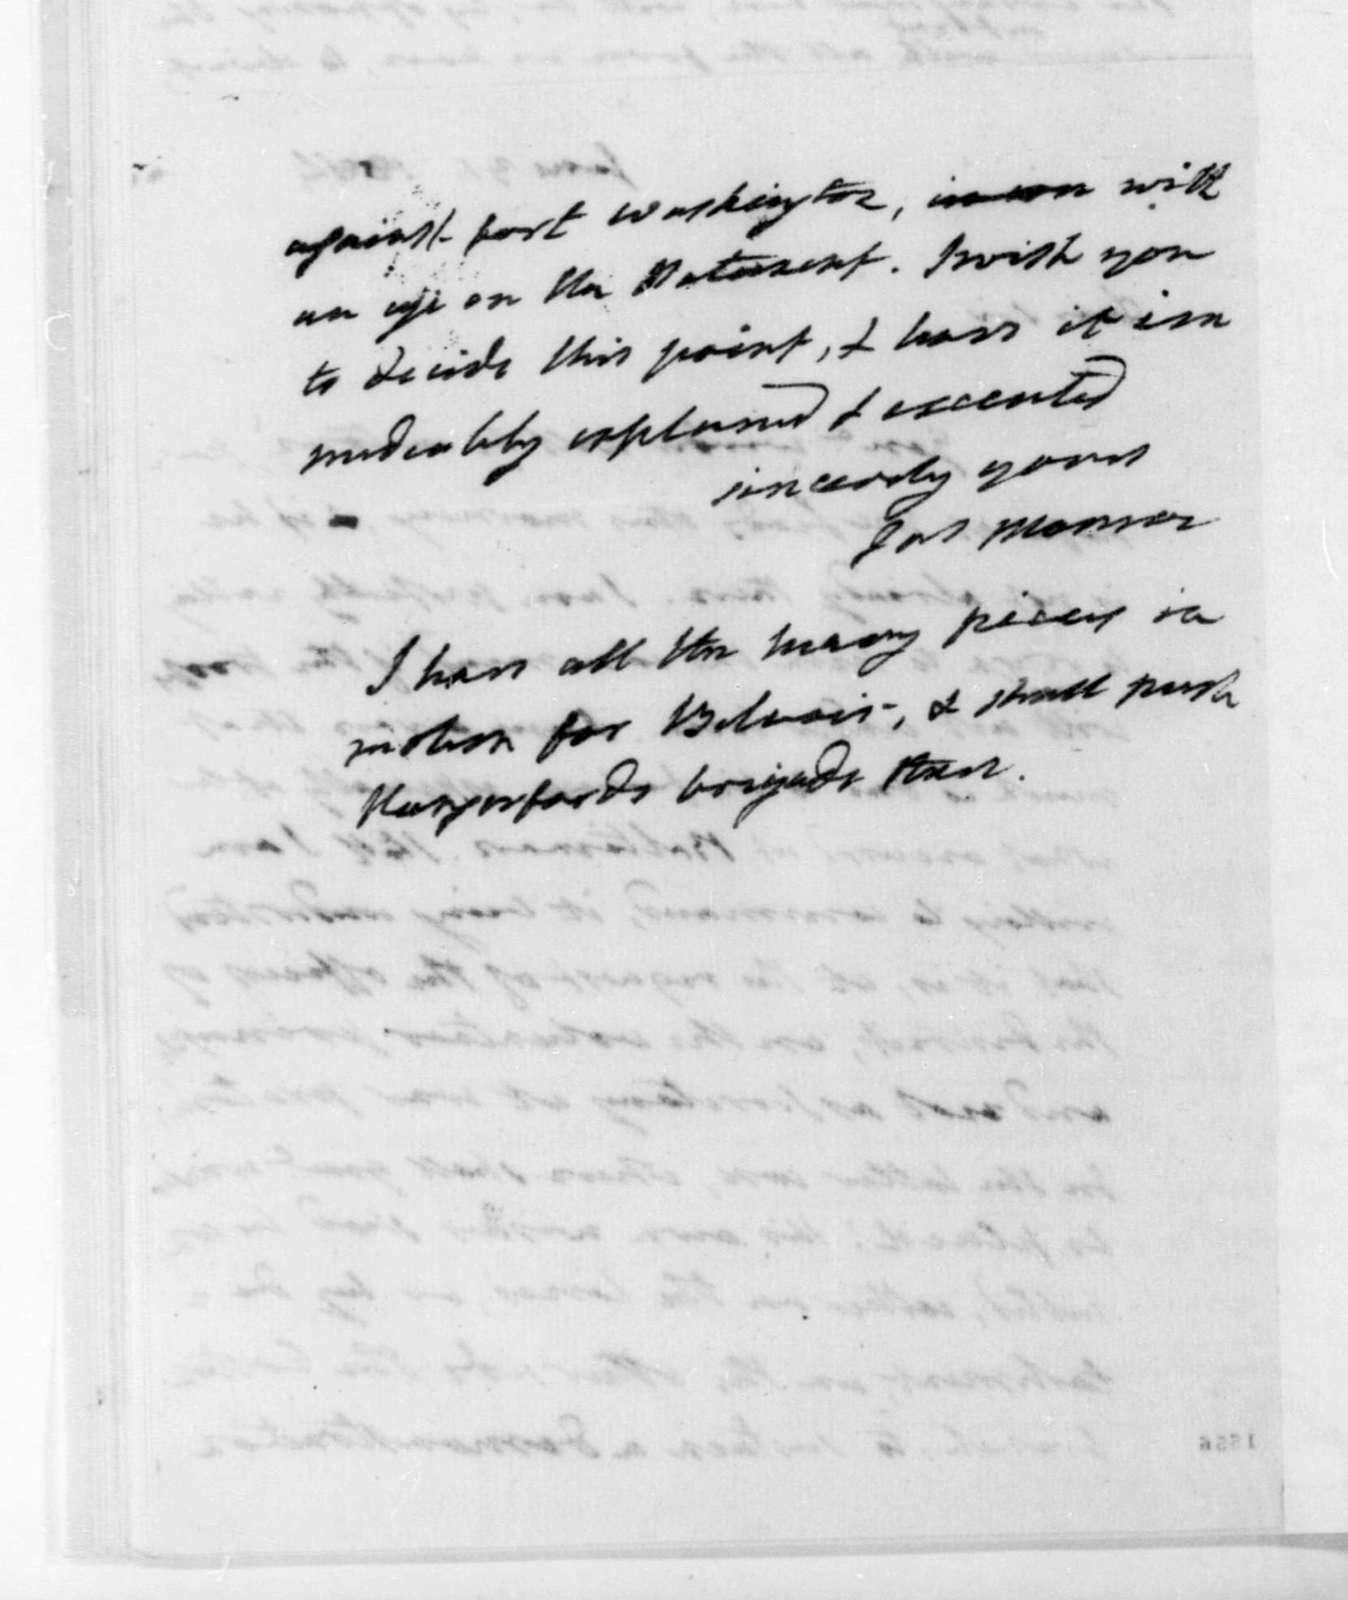 James Monroe to James Madison, August 31, 1814.